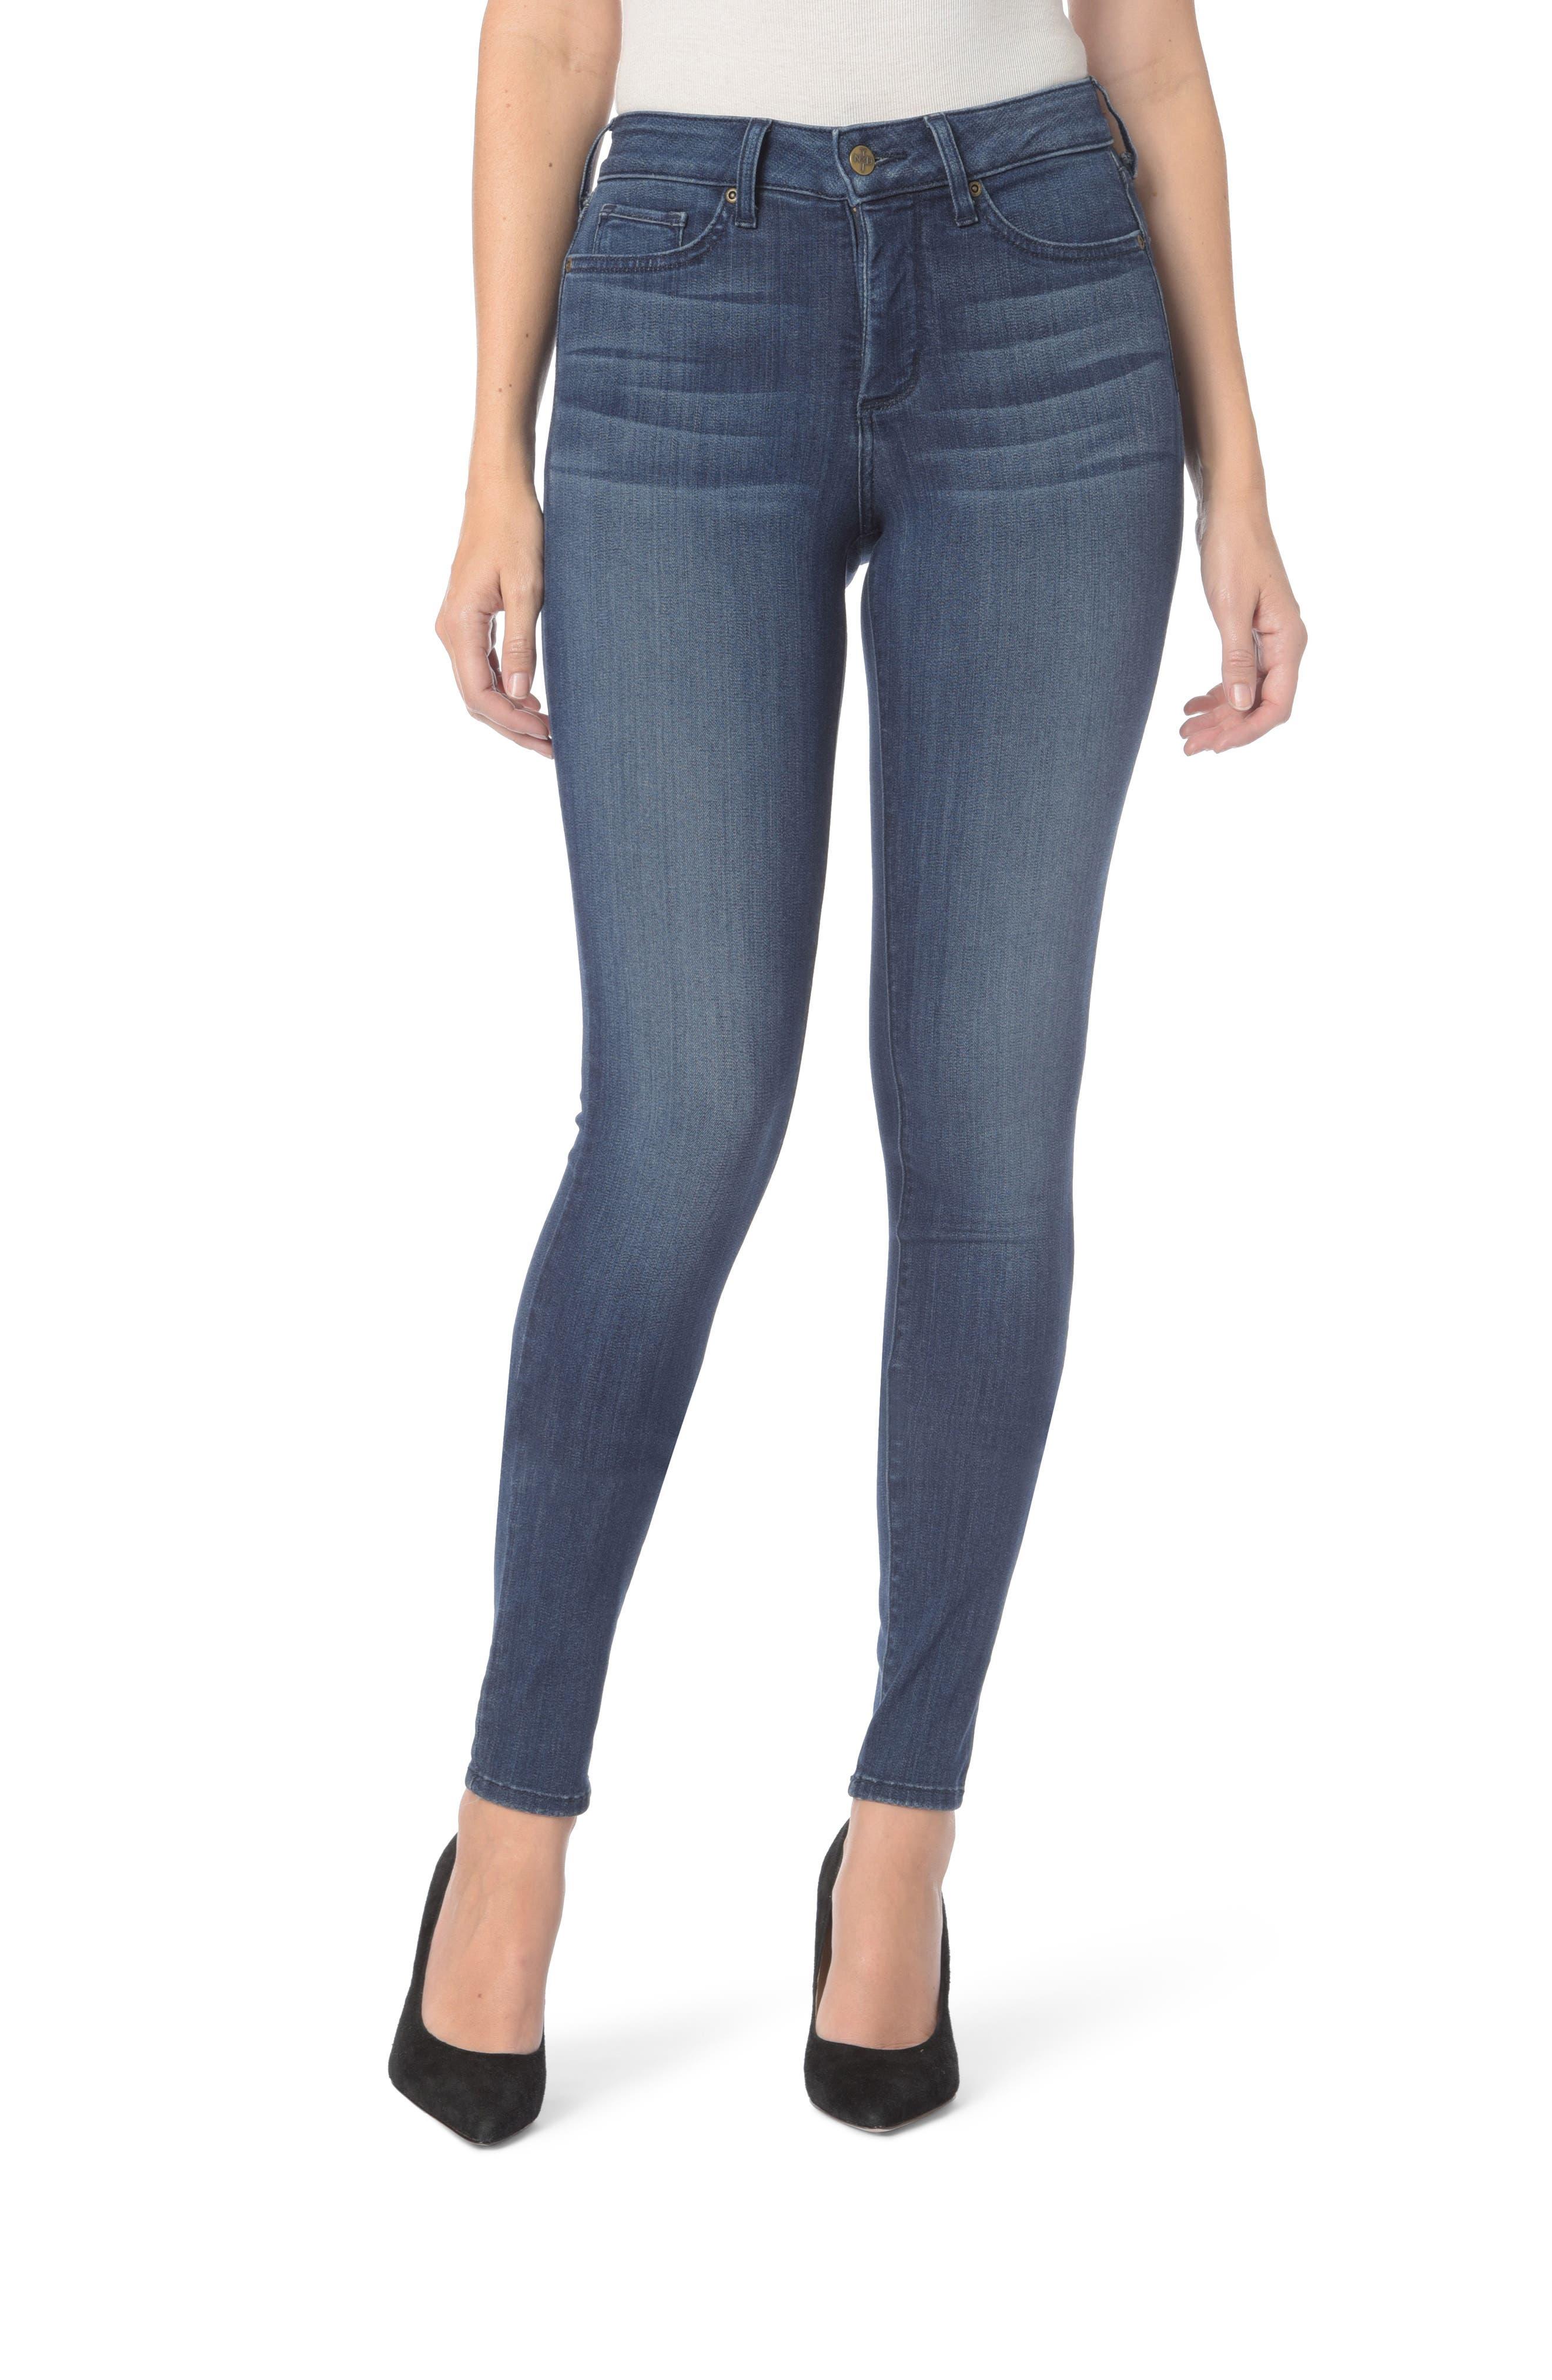 Ami Stretch Super Skinny Jeans,                             Main thumbnail 1, color,                             Lark